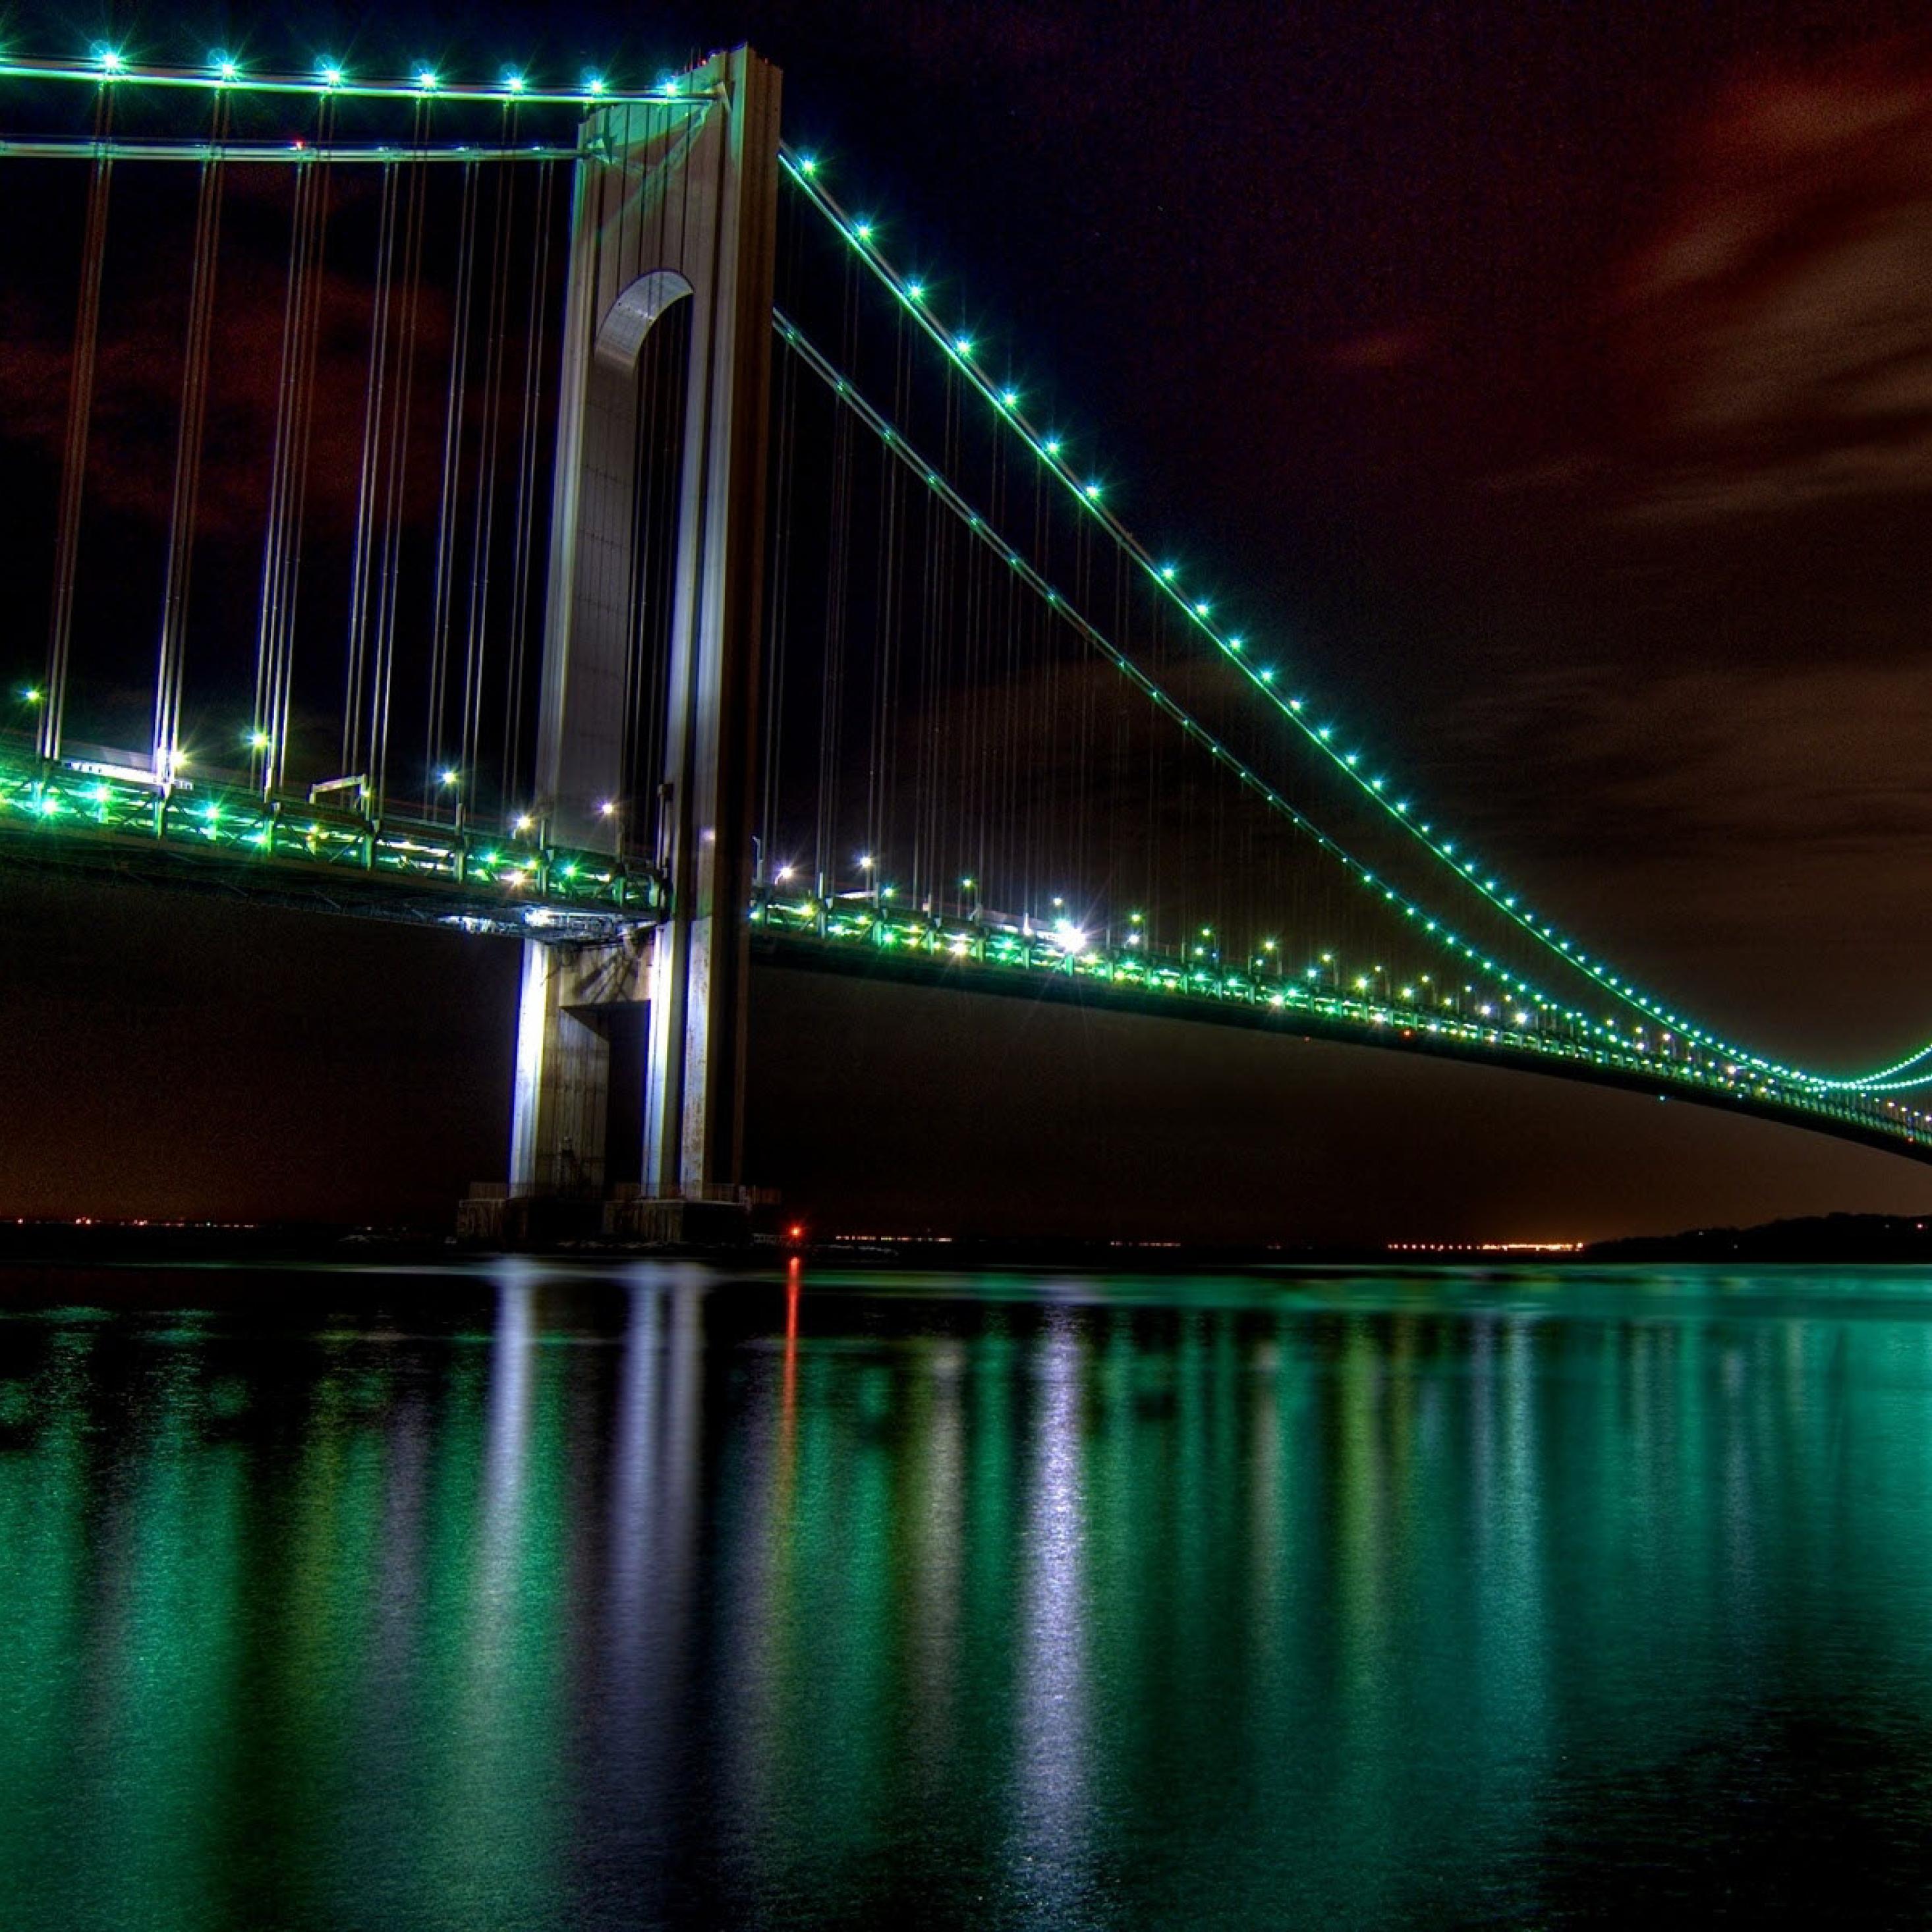 Green Light Bridge, Full HD Wallpaper